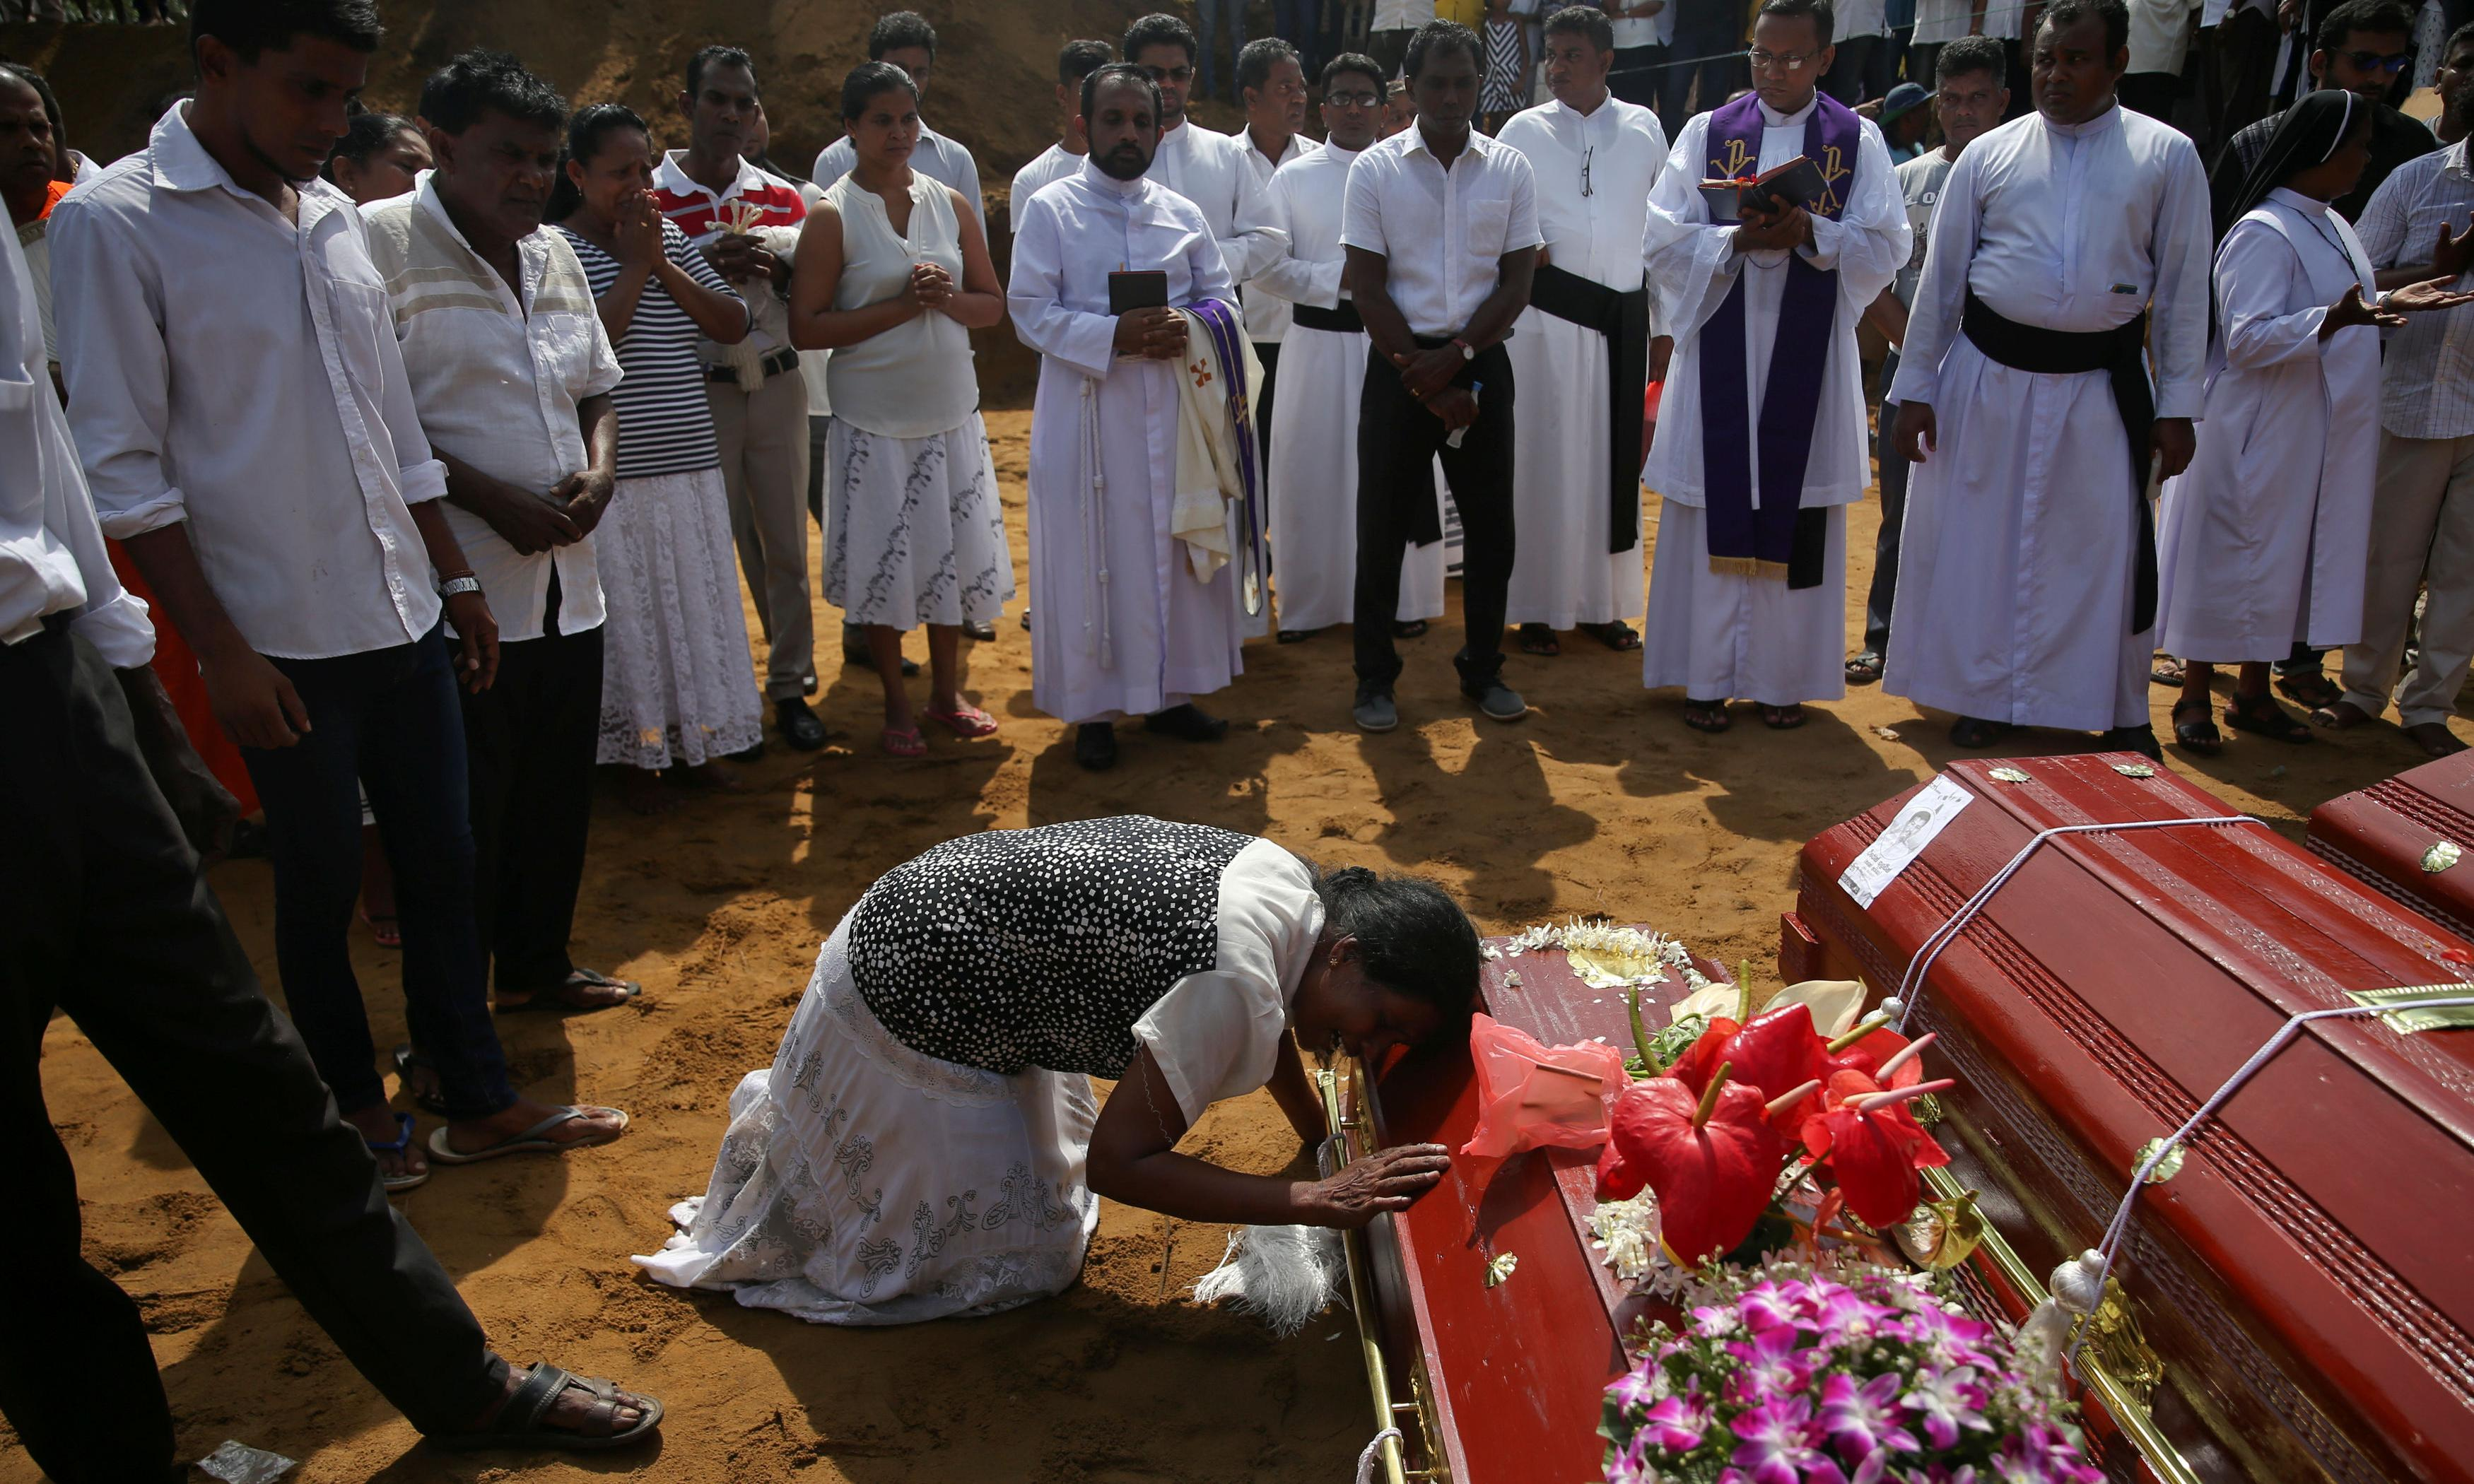 Sri Lanka bombings: Islamic State claims responsibility for attacks